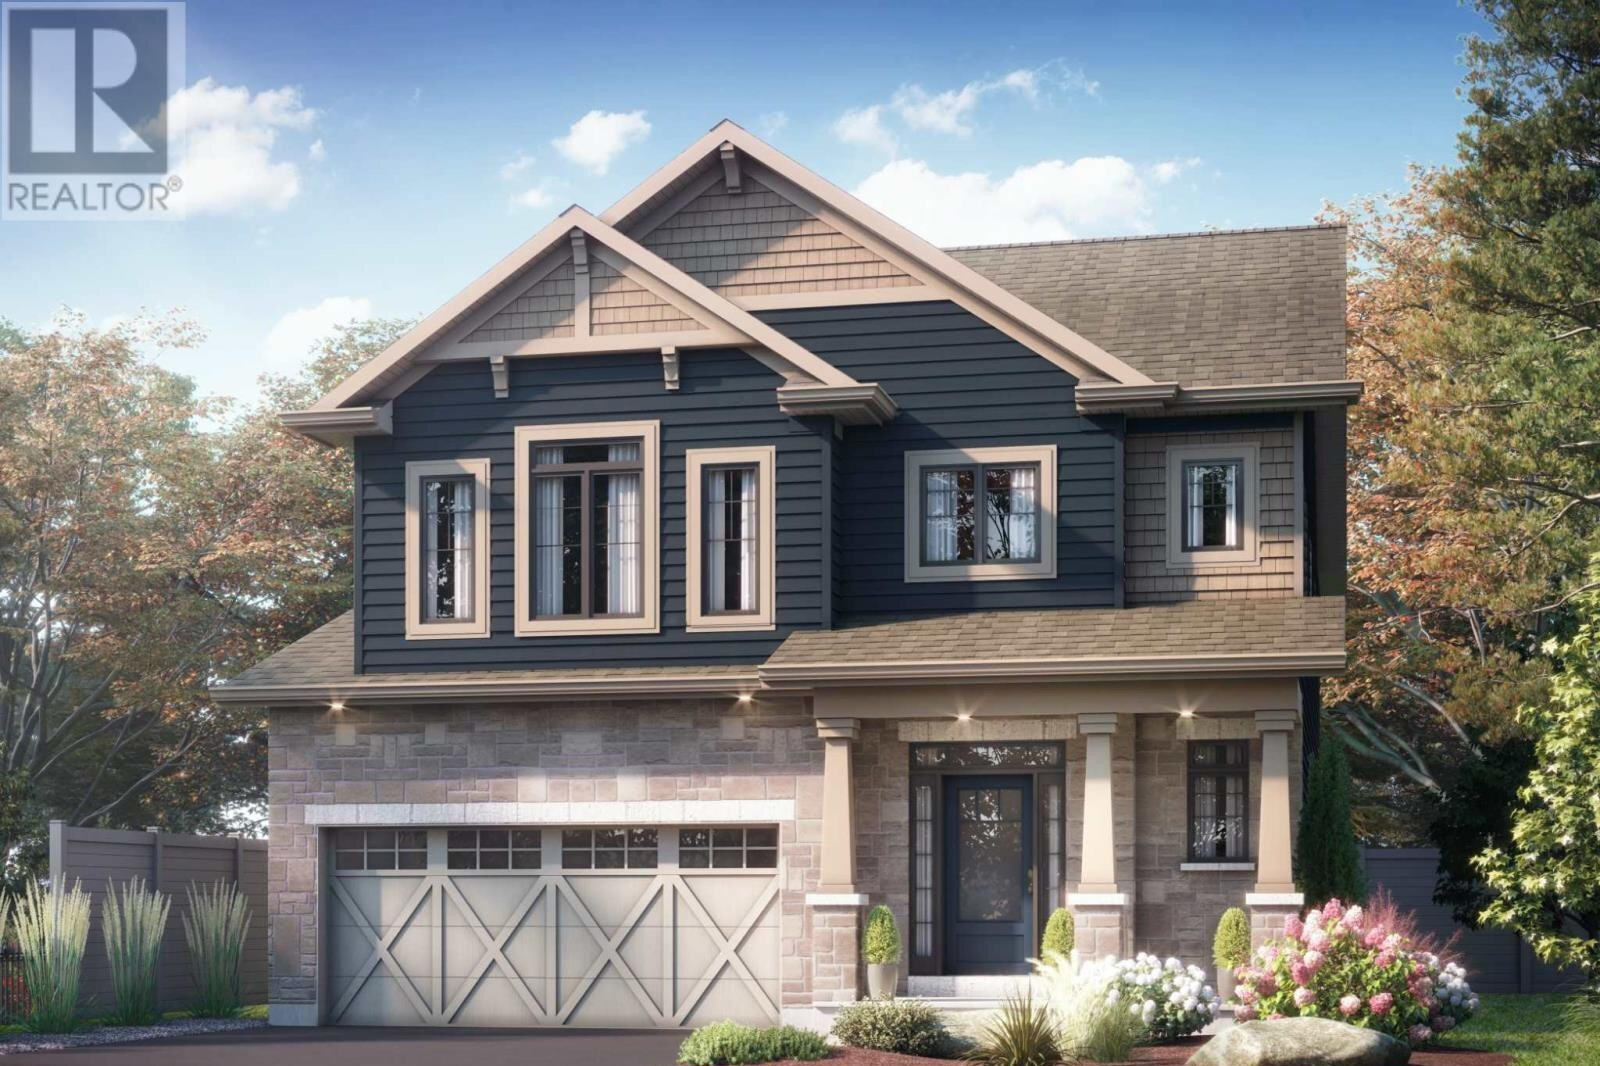 House for sale at 1506 Shira Dr Kingston Ontario - MLS: K20005653